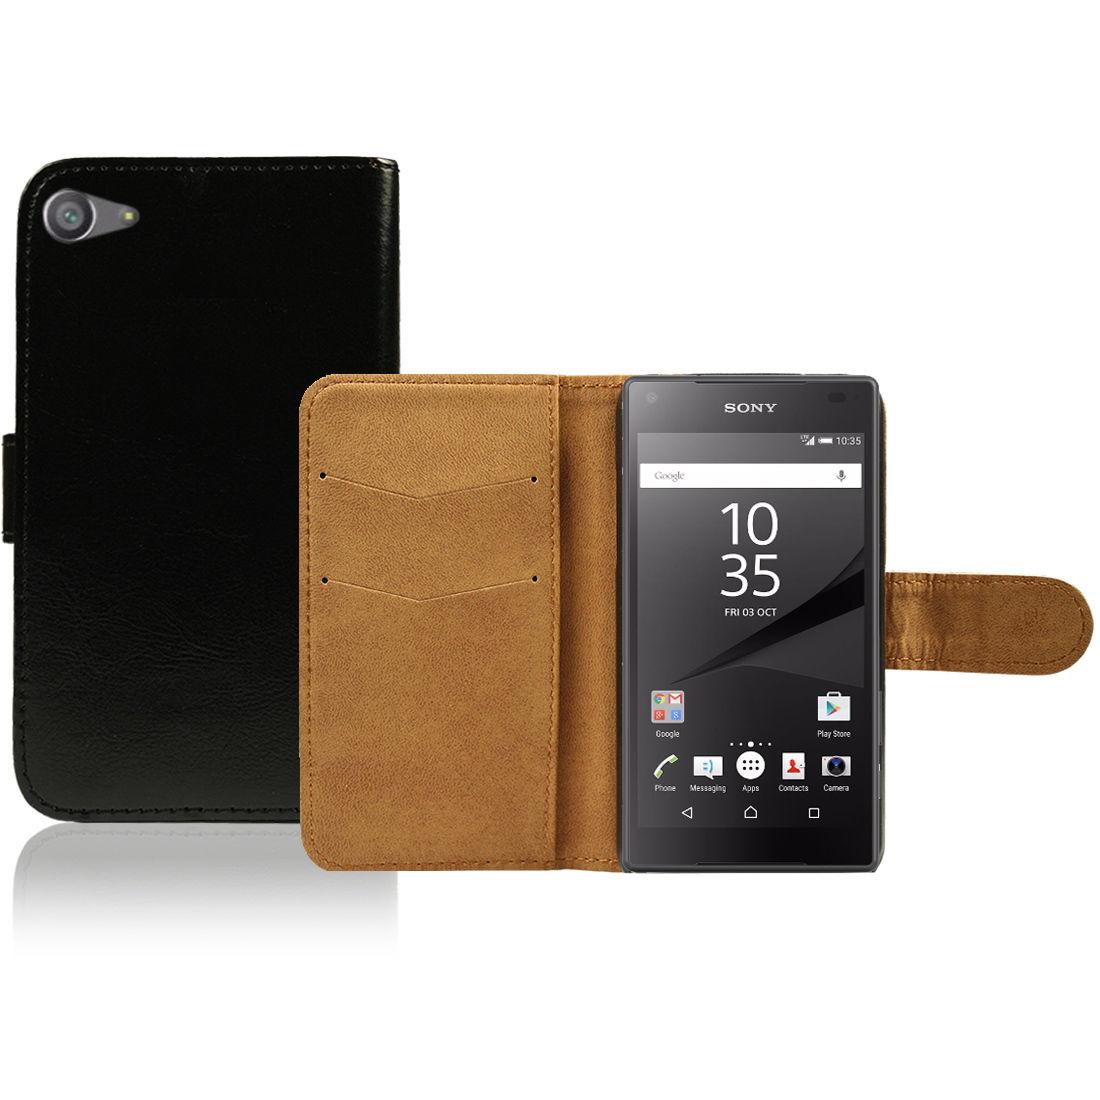 Pouzdro pro Sony Xperia Z5 Compact černé